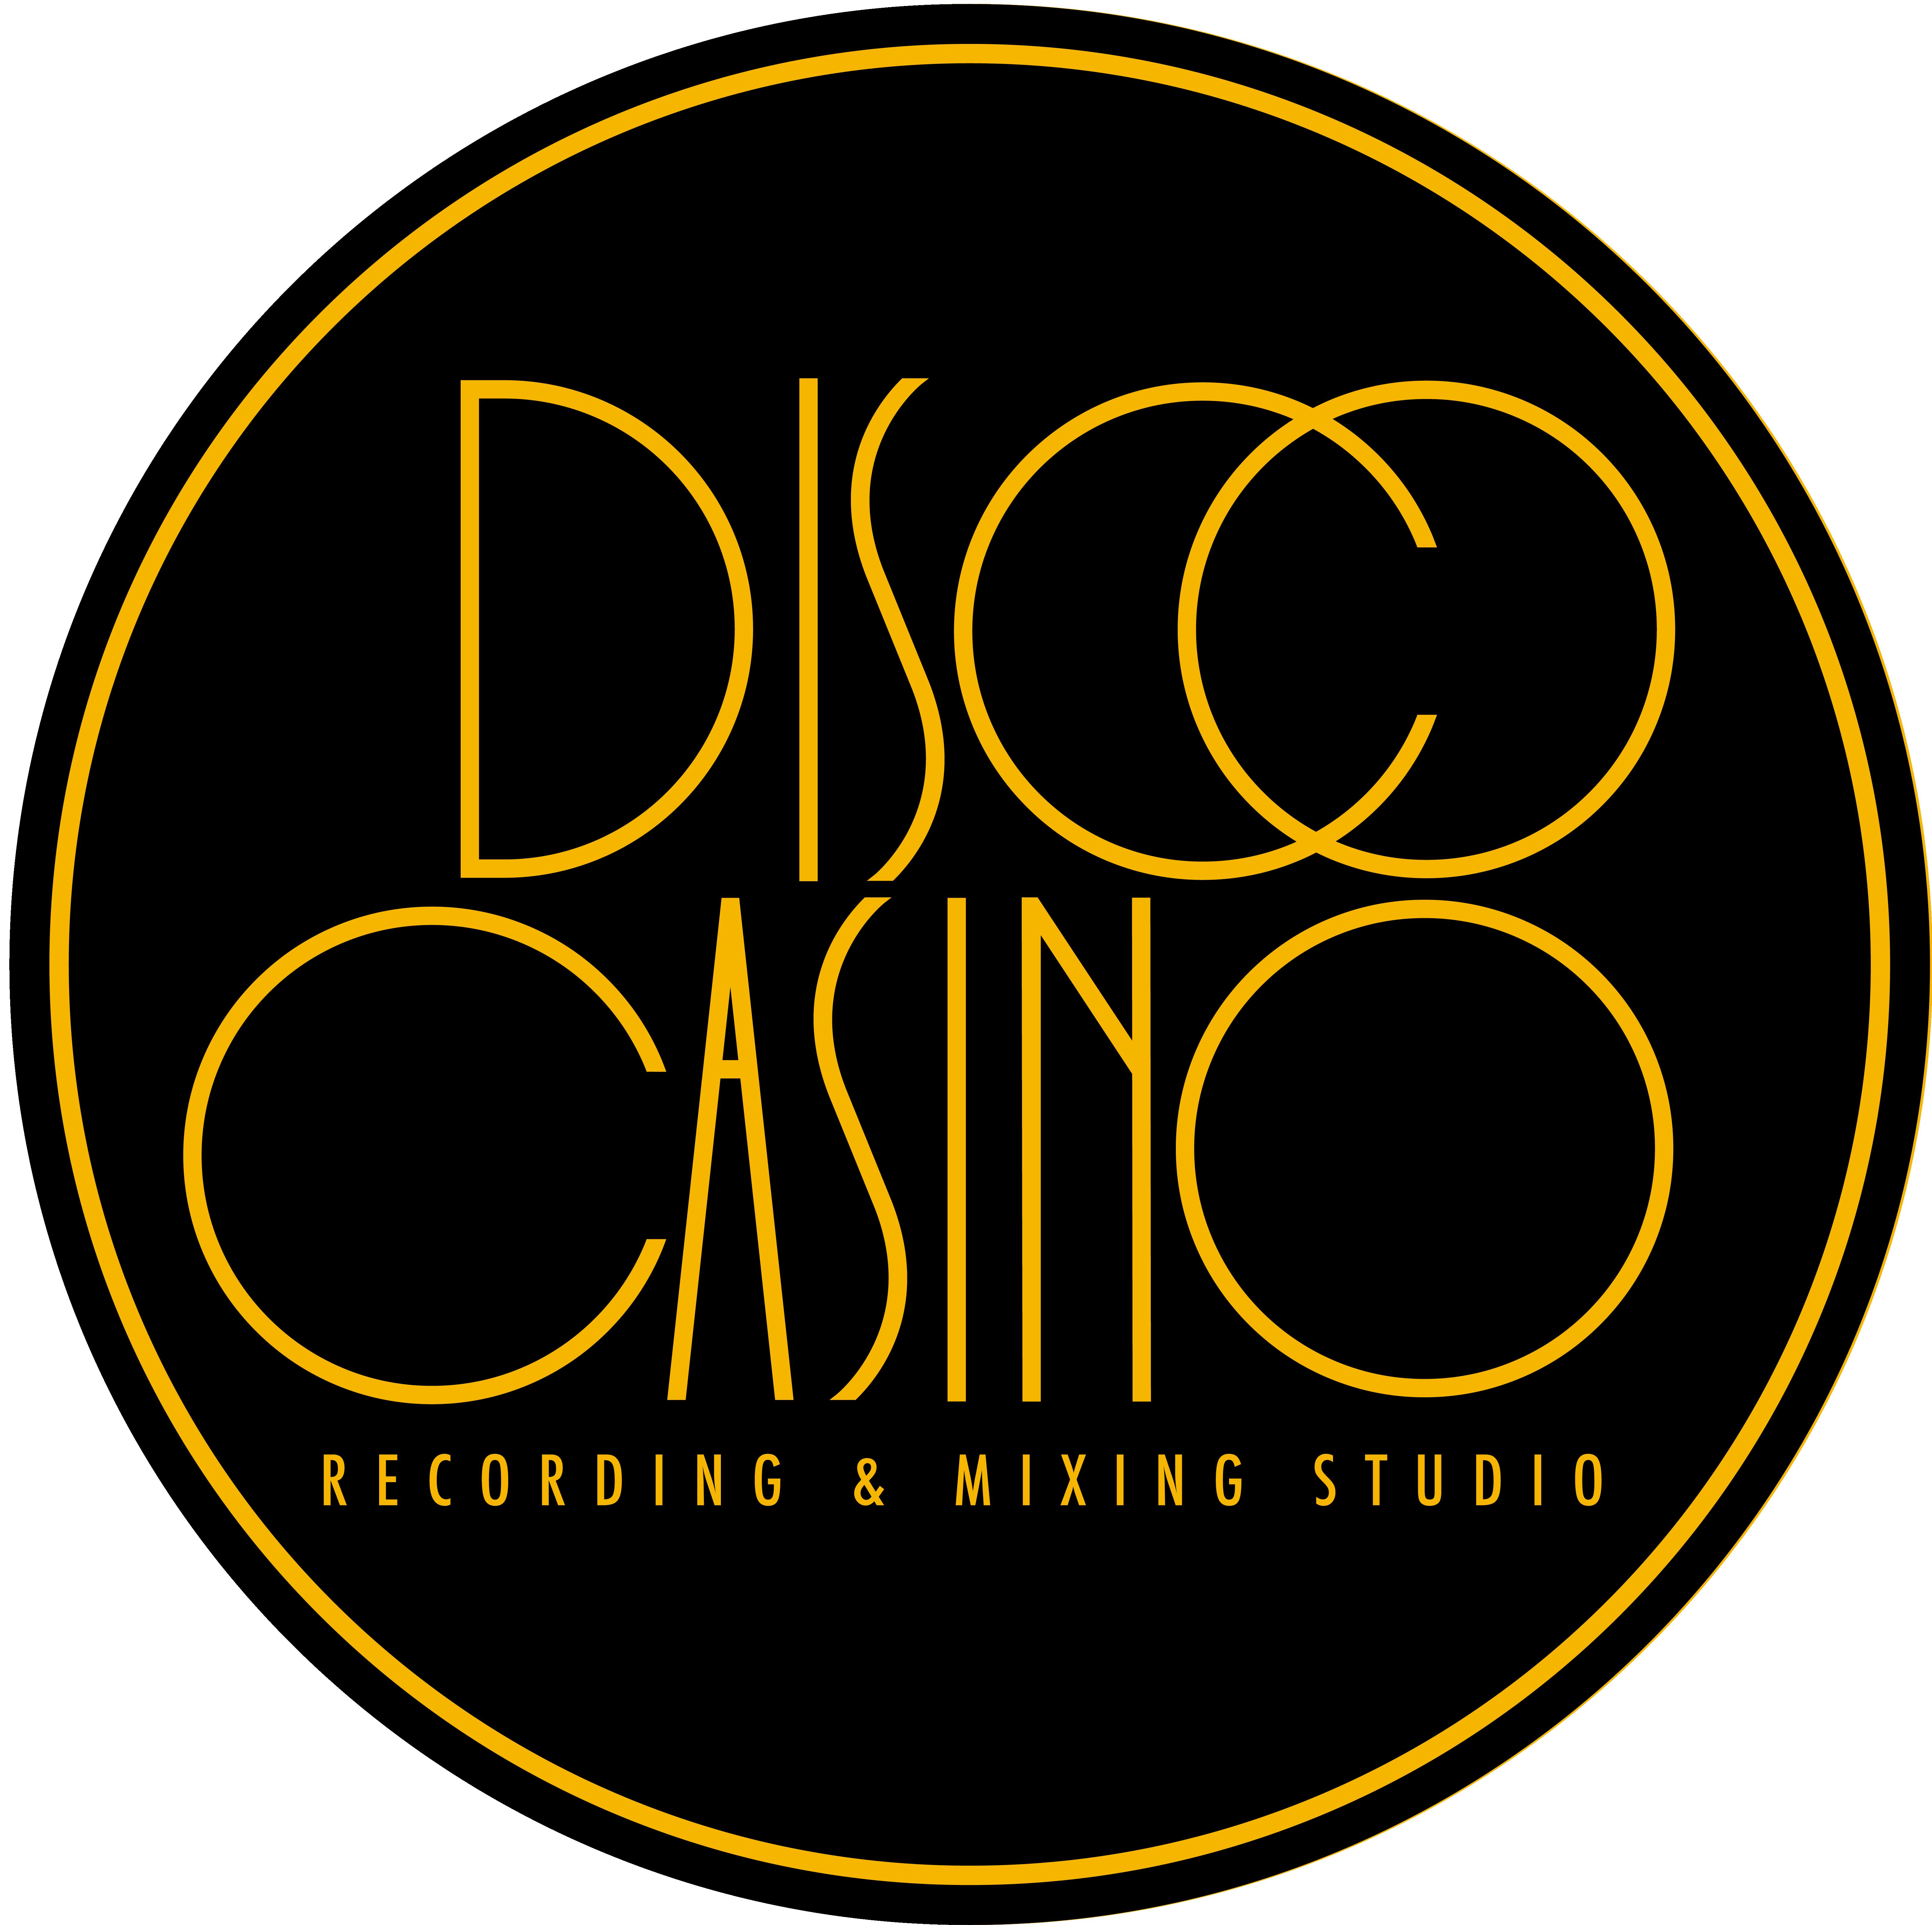 DiscoCasino Studio